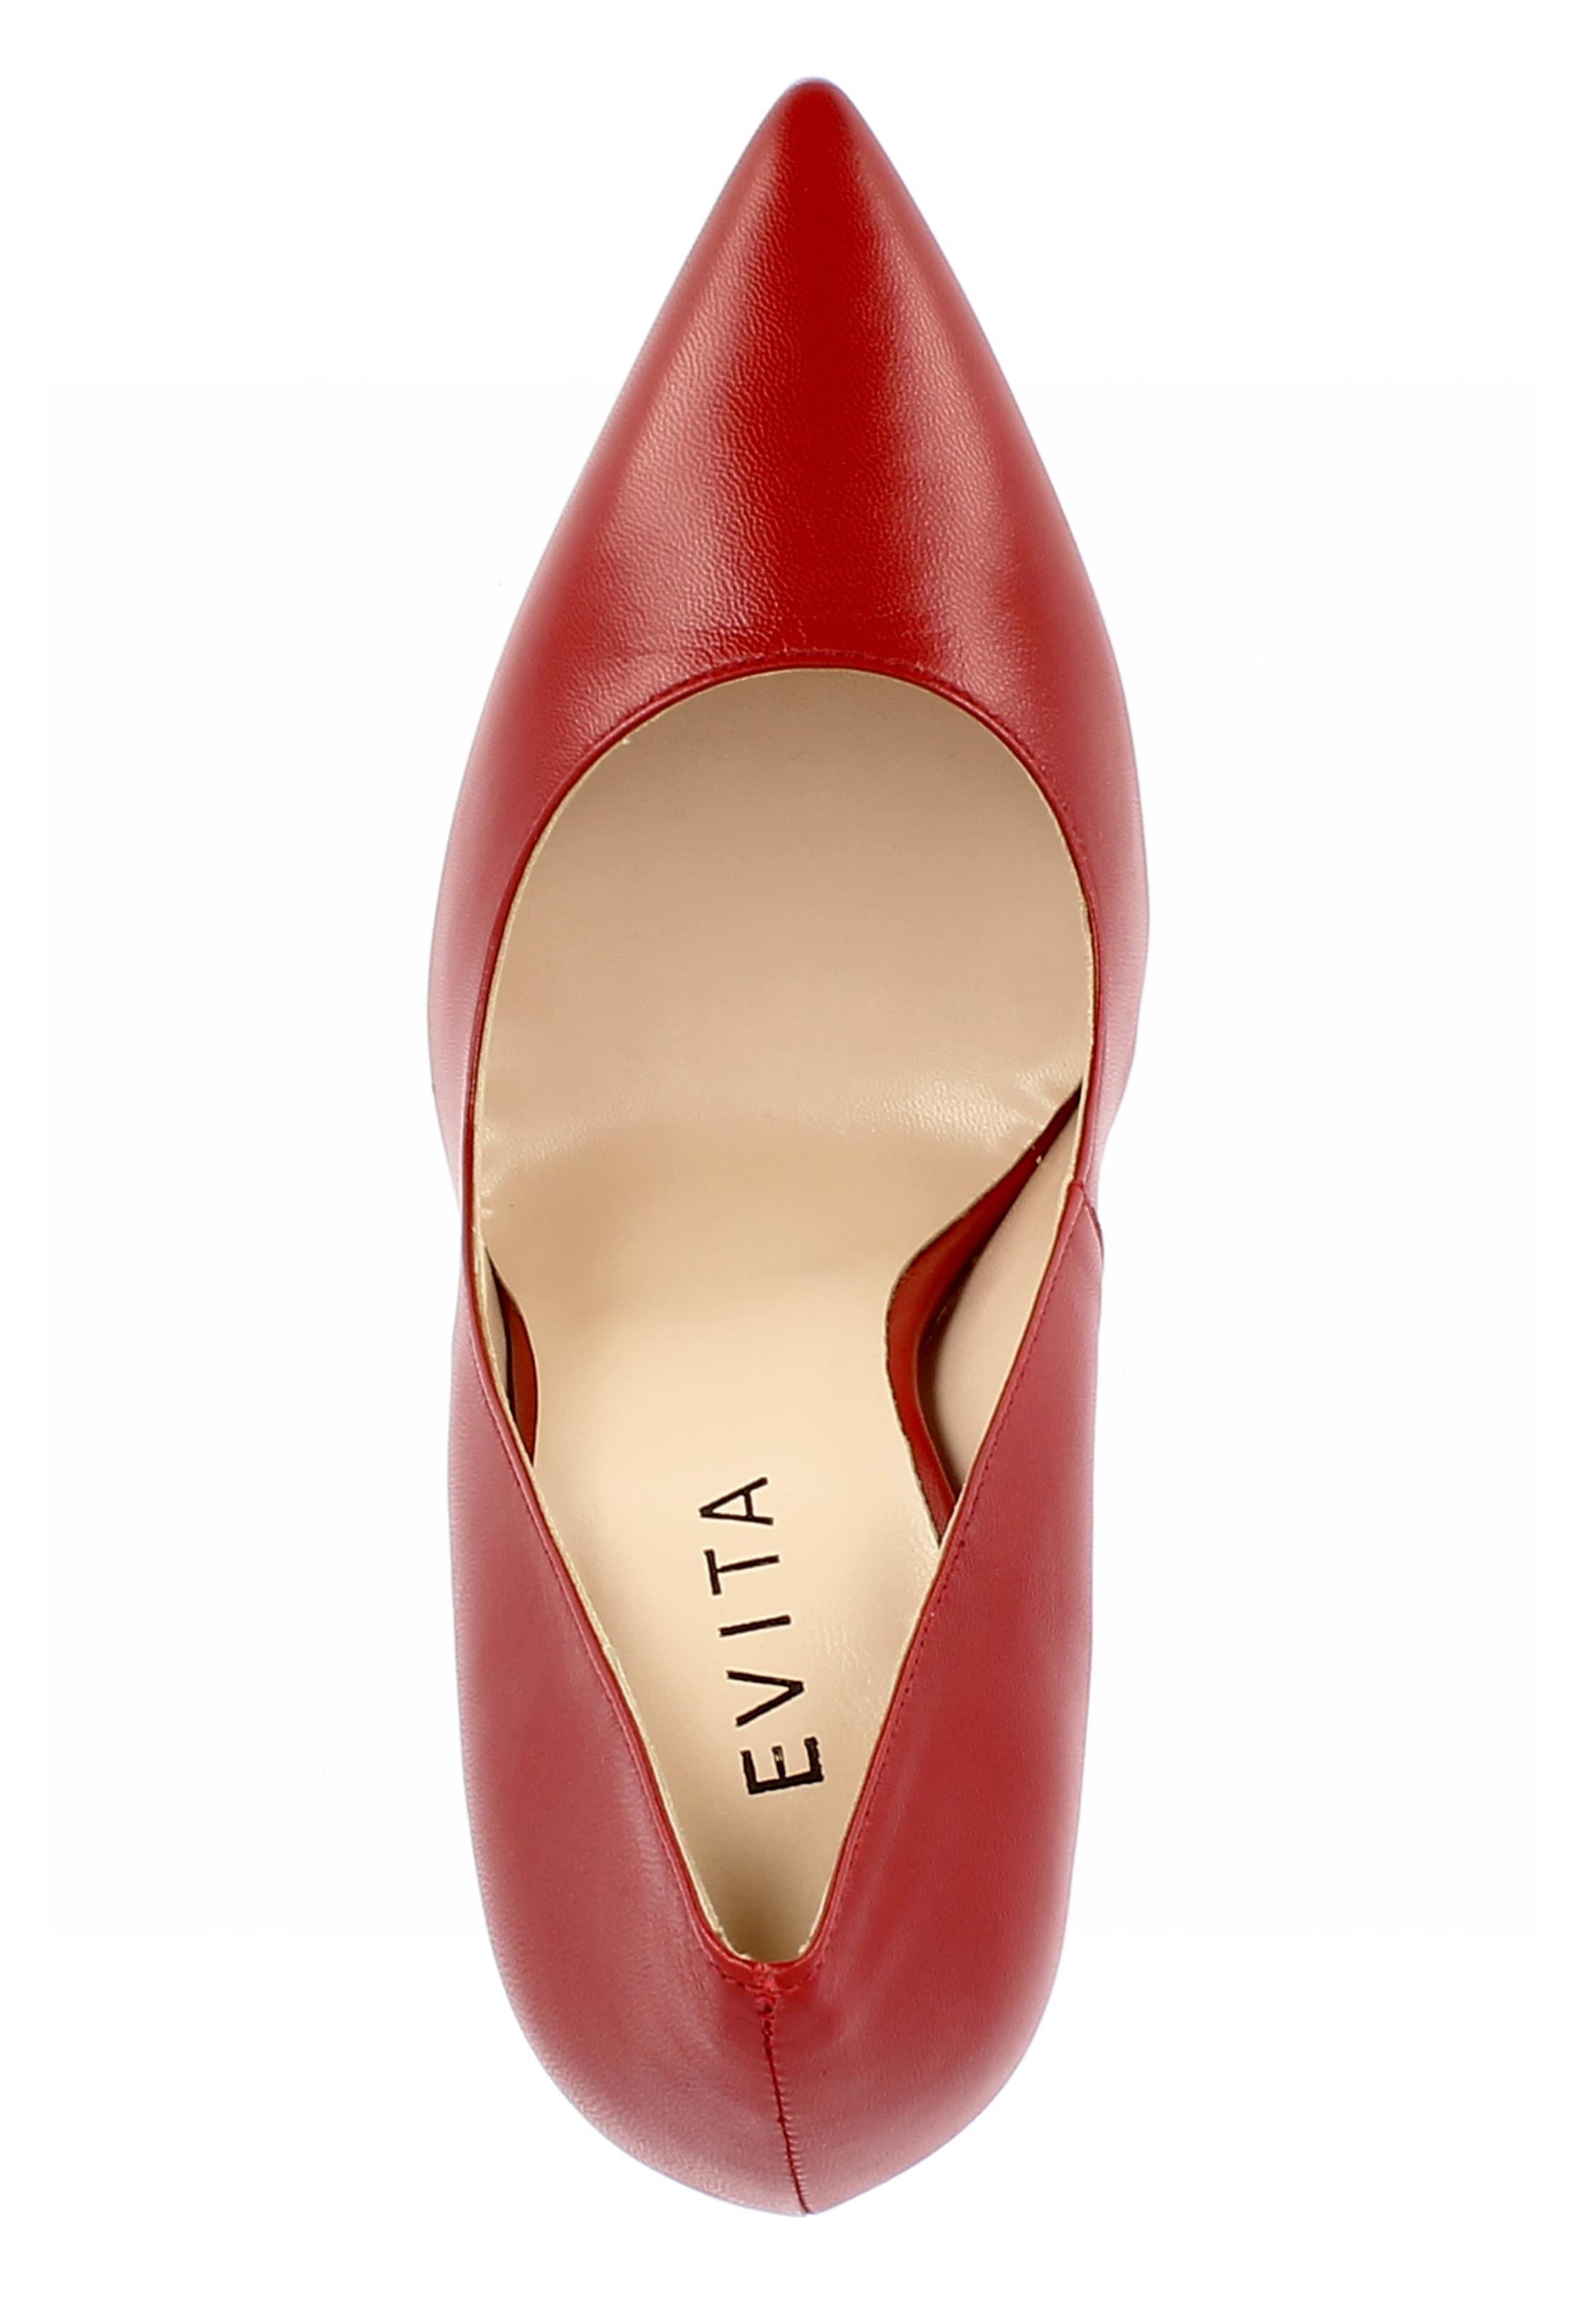 'lisa' Escarpins En Escarpins En 'lisa' Evita 'lisa' Evita Evita En Escarpins Rouge Rouge mvn0ON8yw